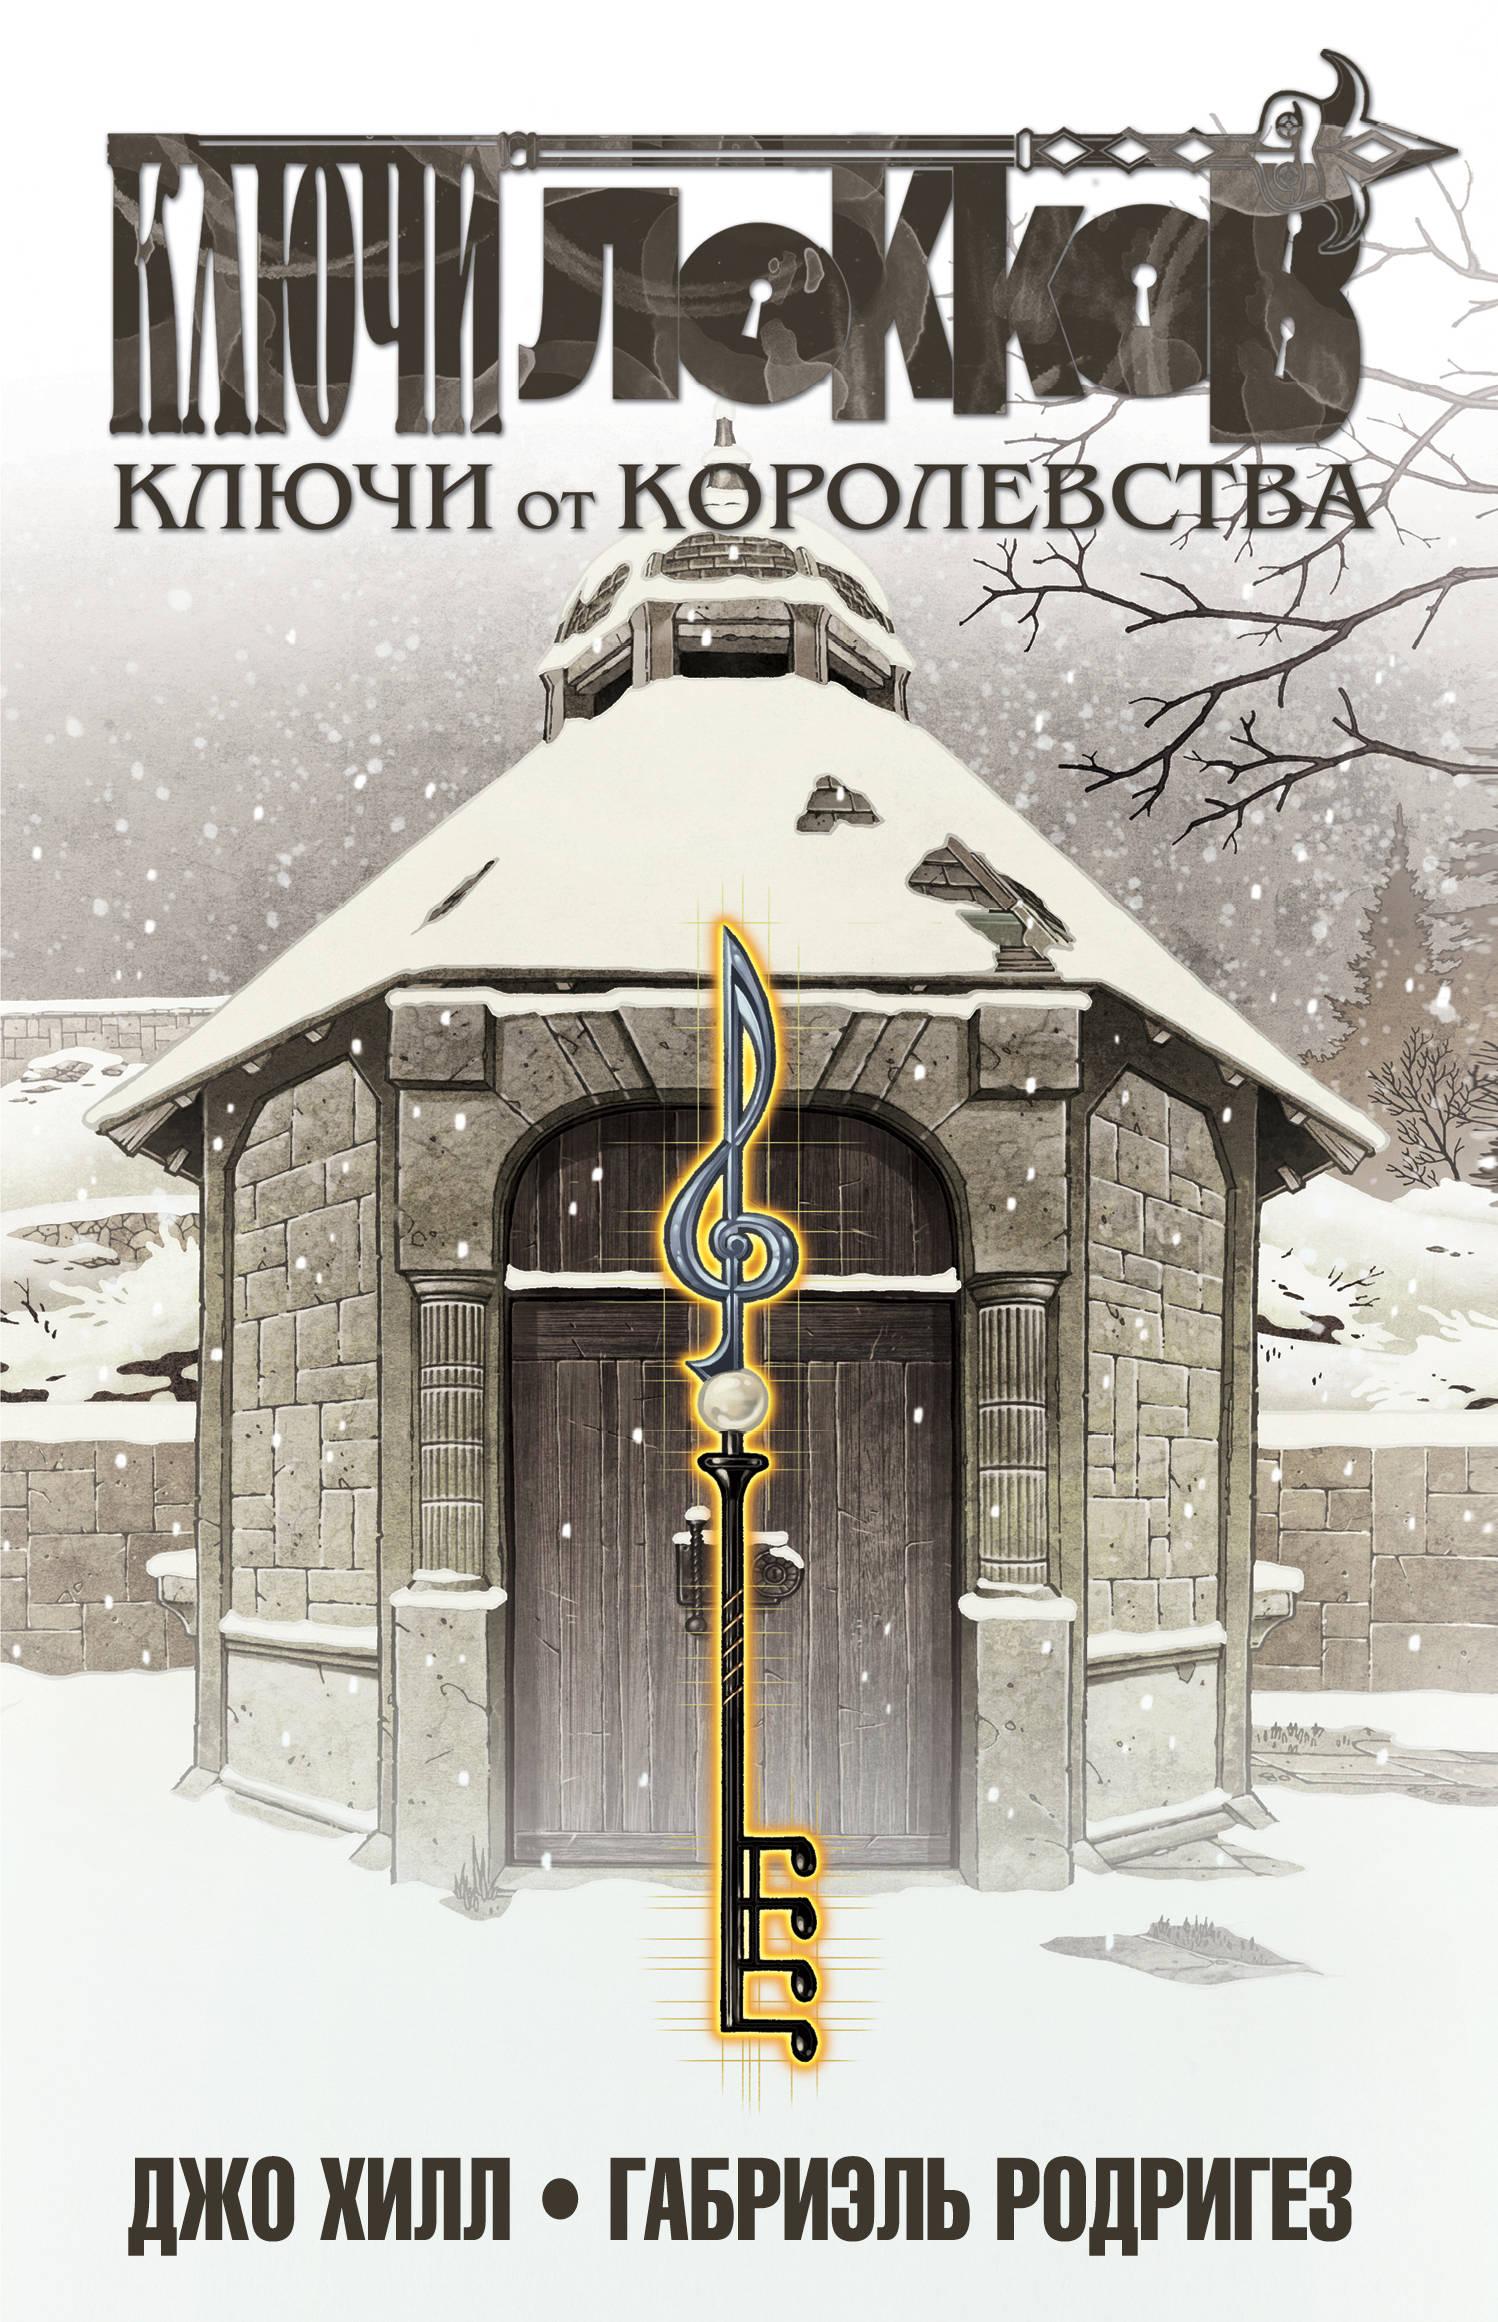 Kljuchi Lokkov. Tom 4. Kljuchi ot korolevstva